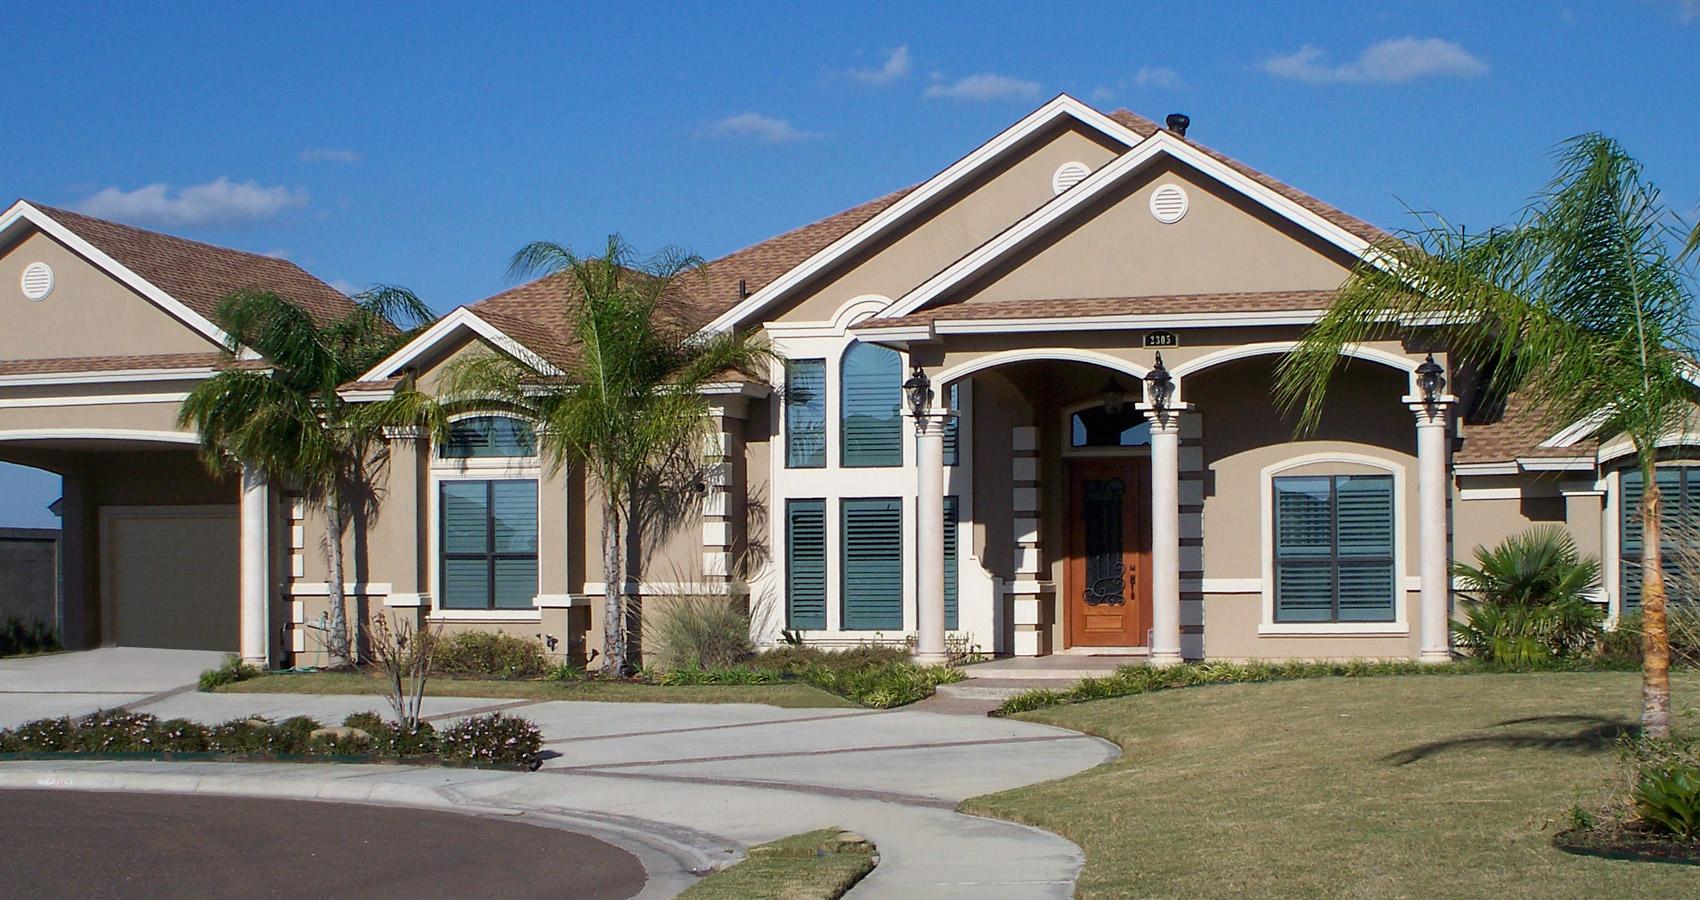 100_0529_Poteet-Laredo-House_Slider